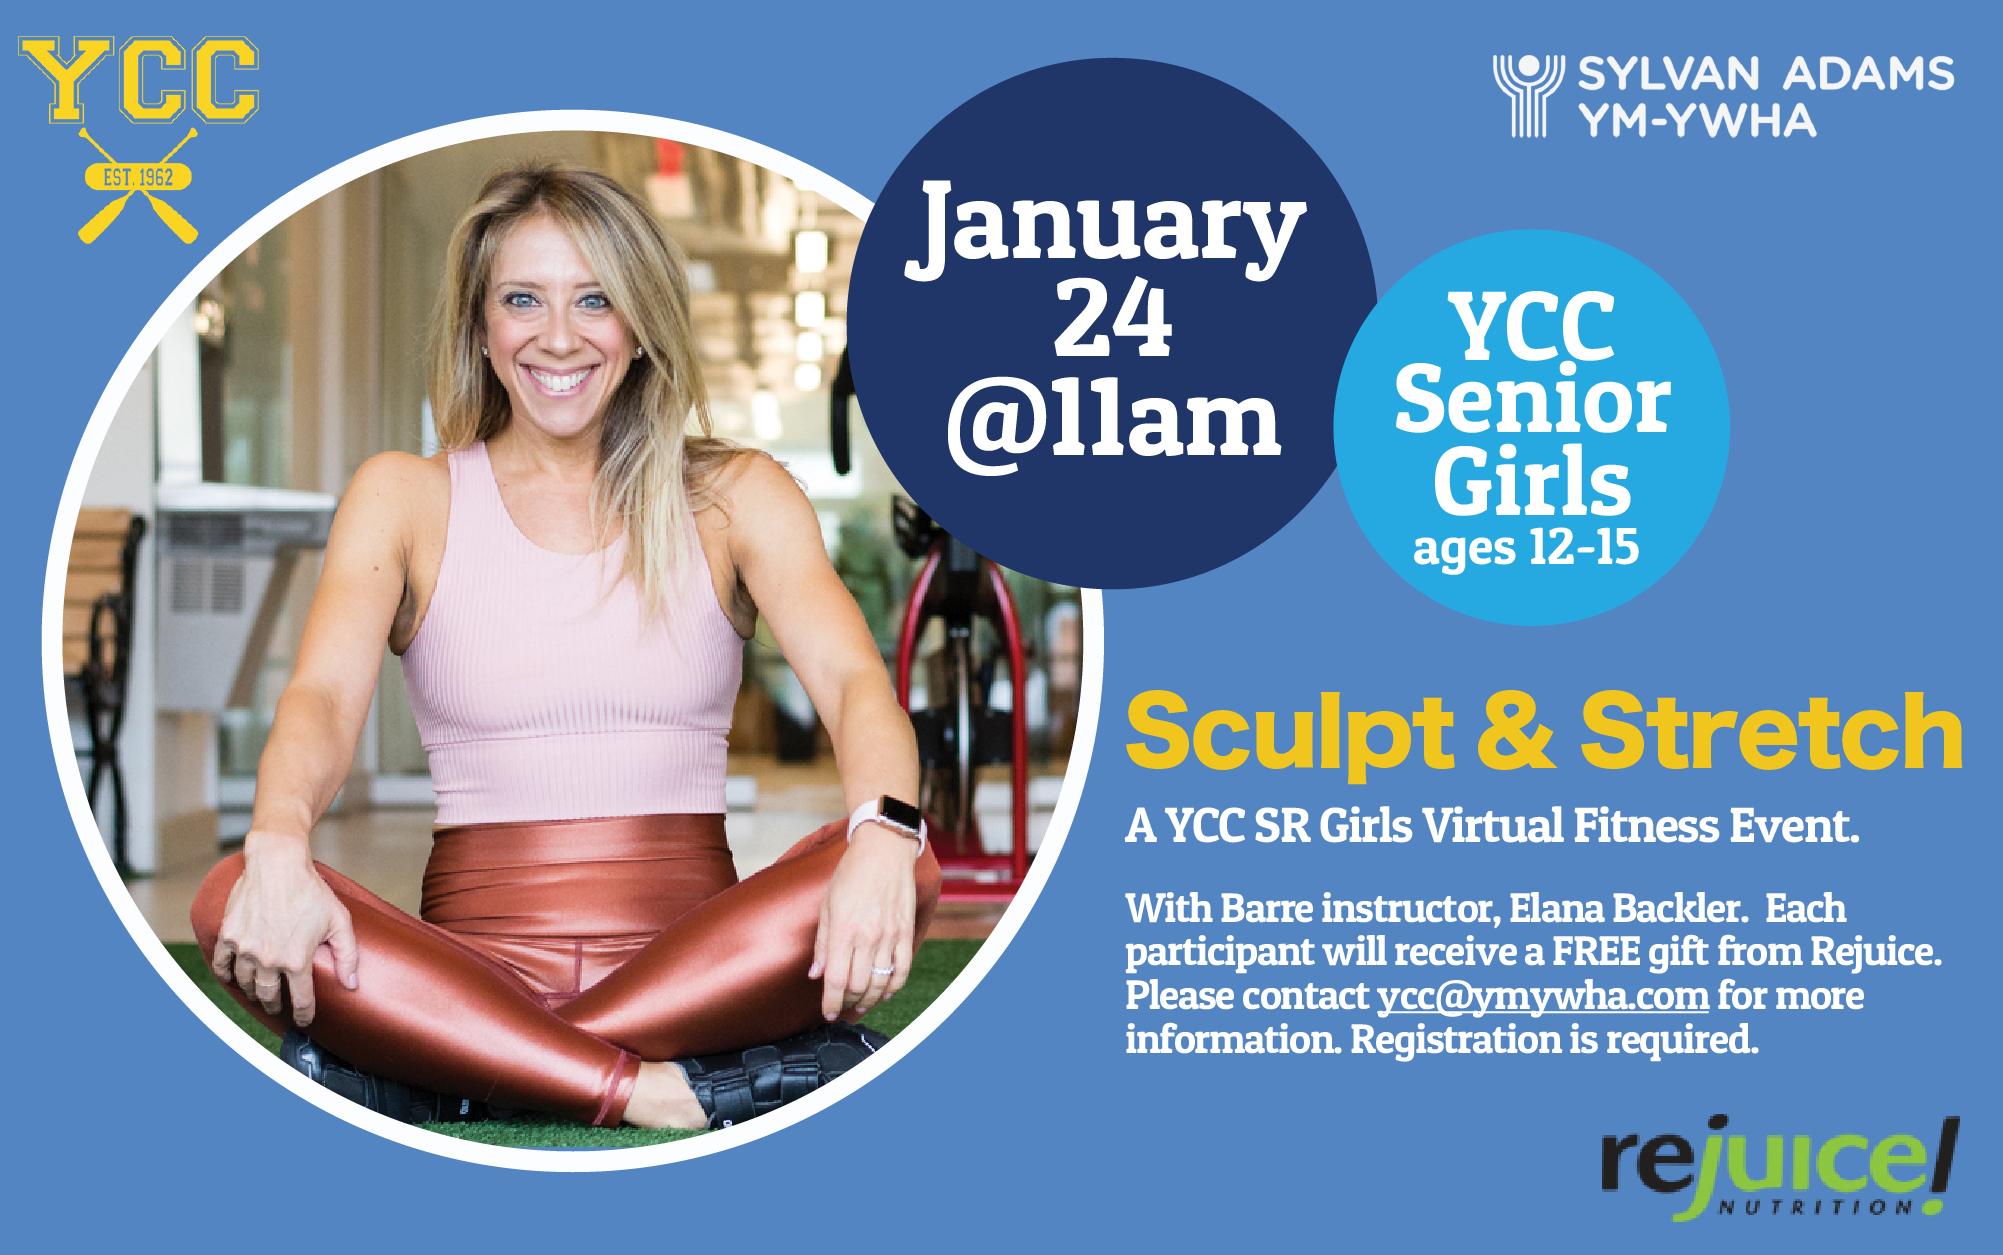 Sculpt & Stretch - A YCC Virtual Fitness Event